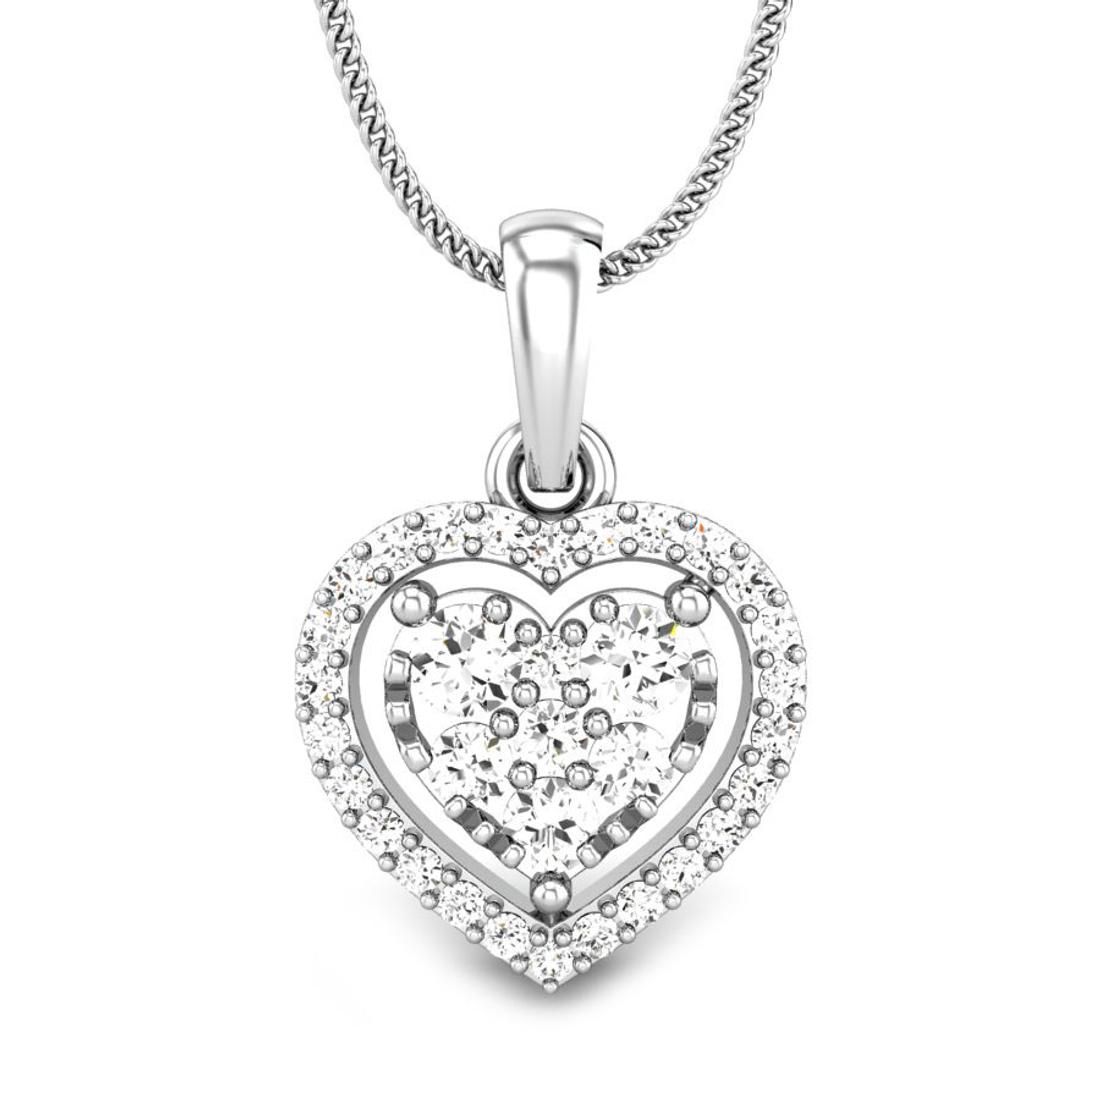 Candere by Kalyan Jewellers White Gold Elaina Ziah Diamond Pendant for Women (IGI Certified)